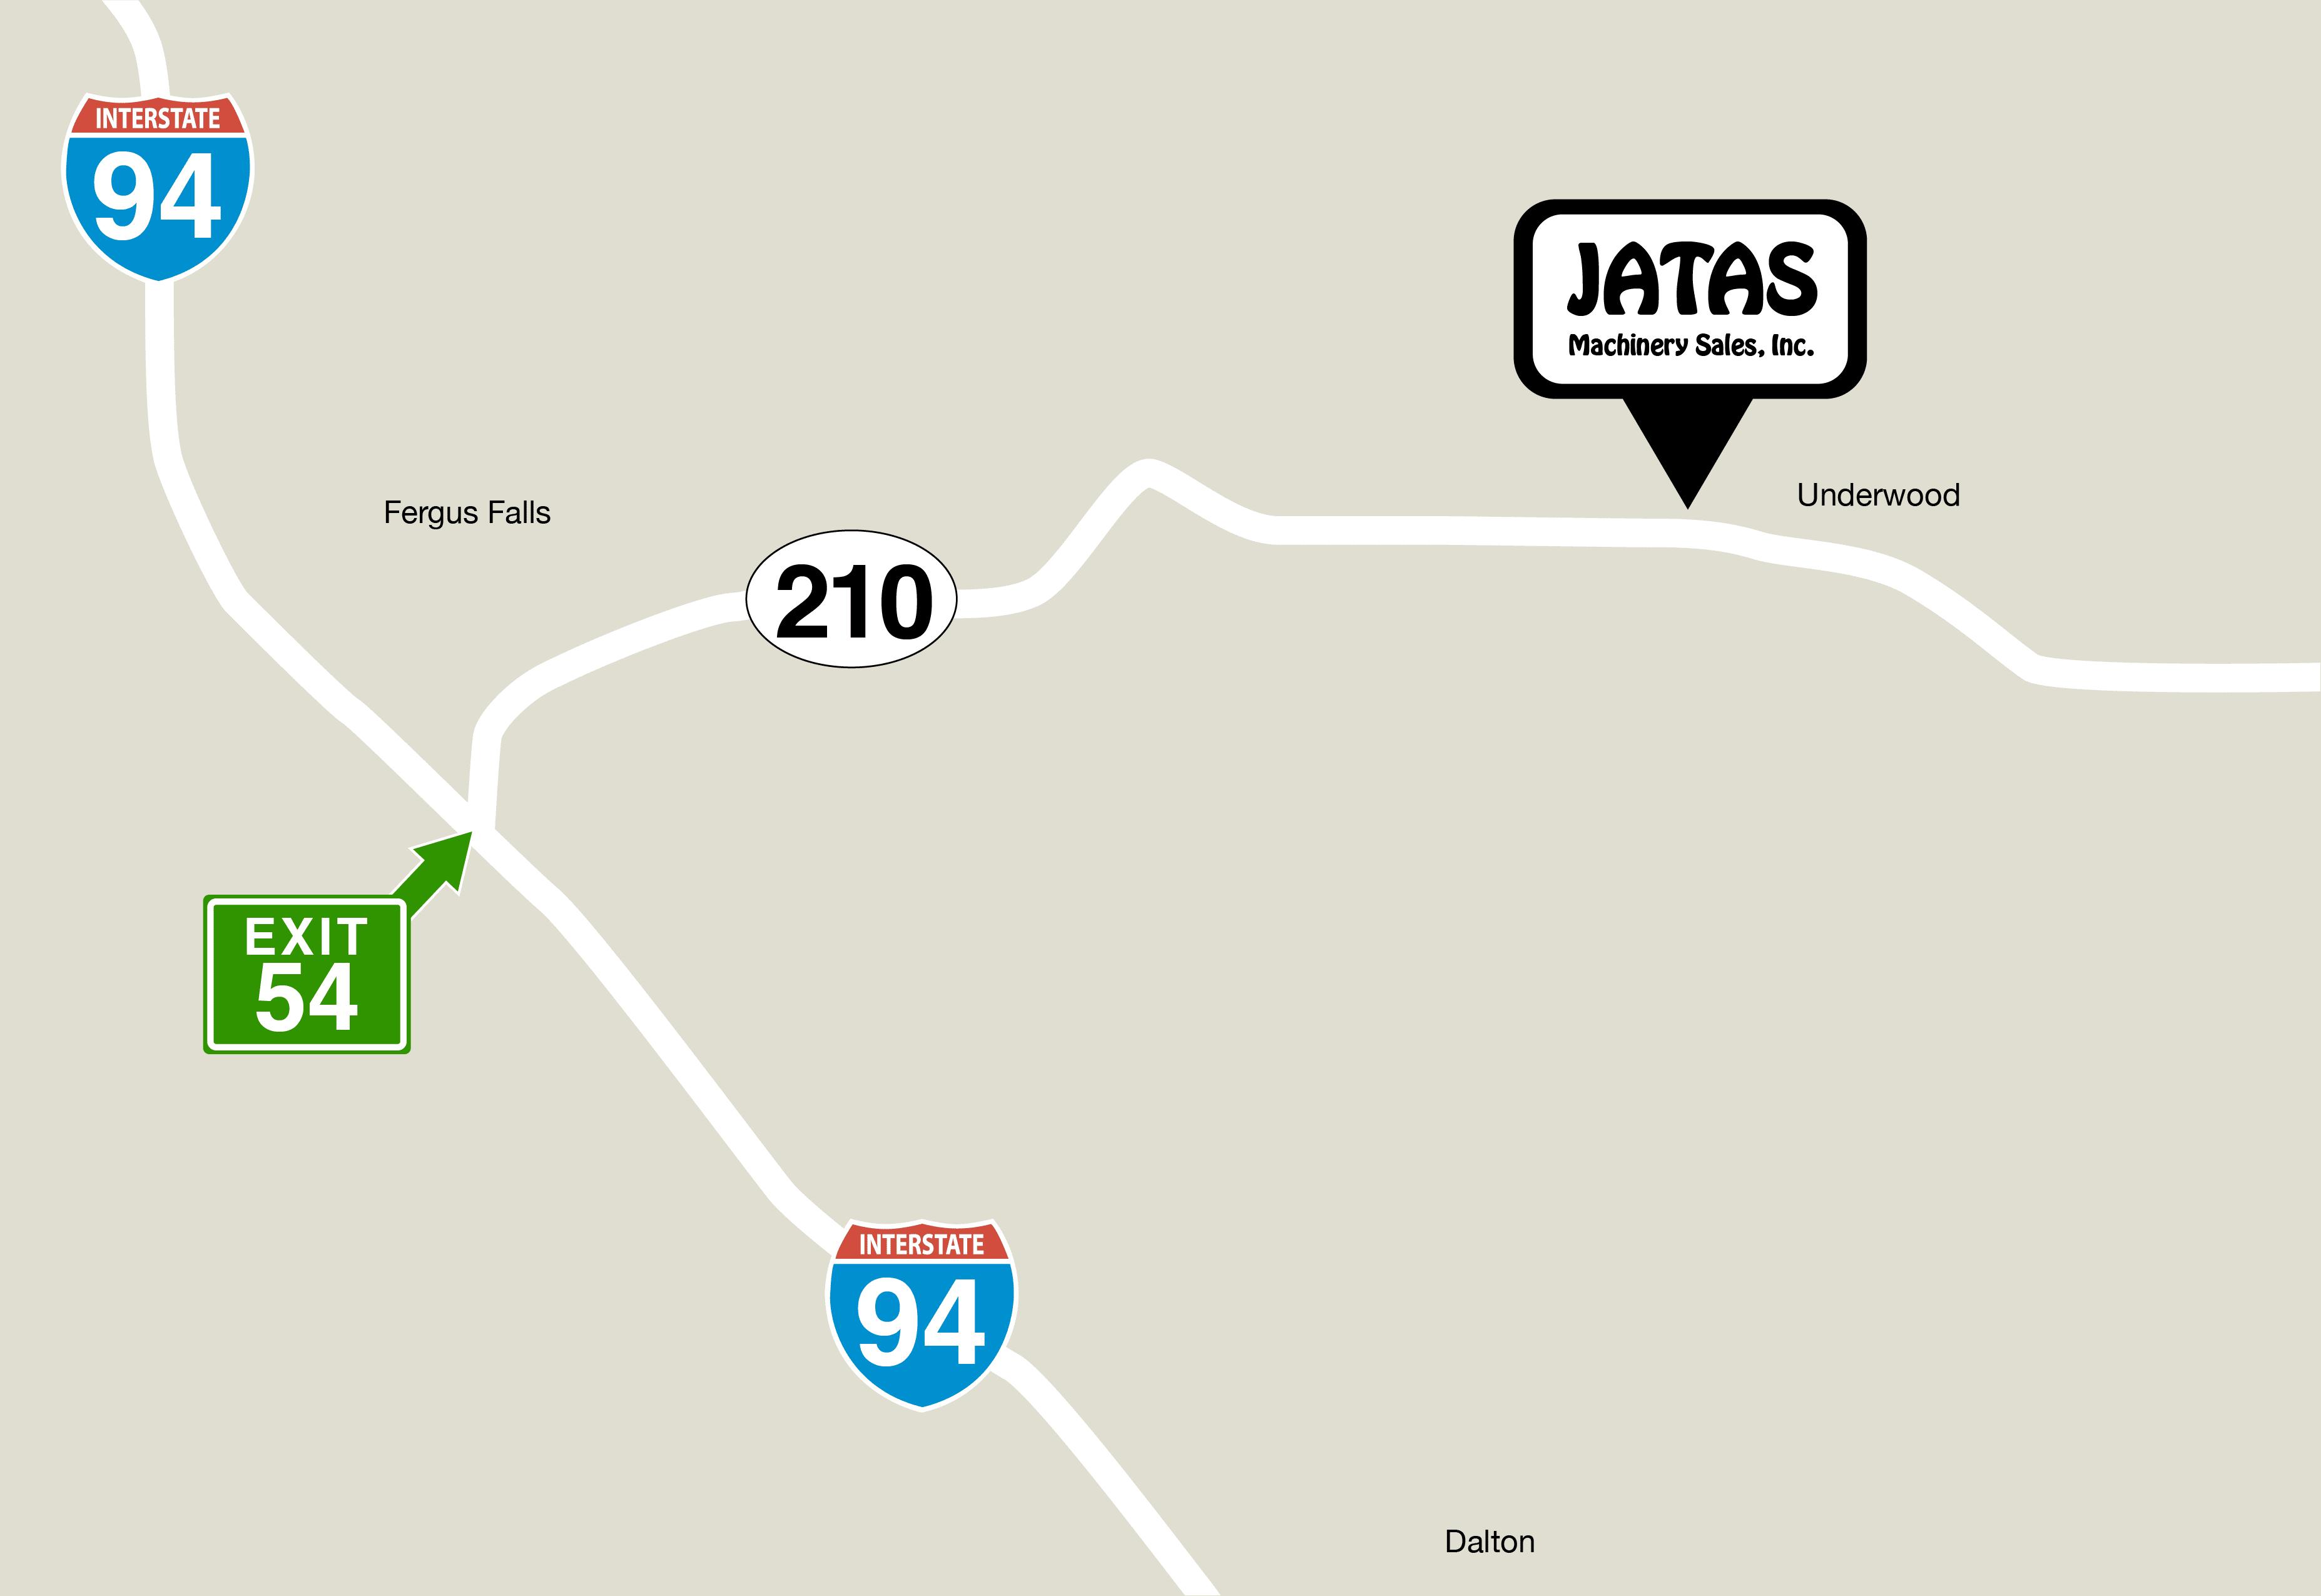 JATAS Machinery Sales Inc. Location Map